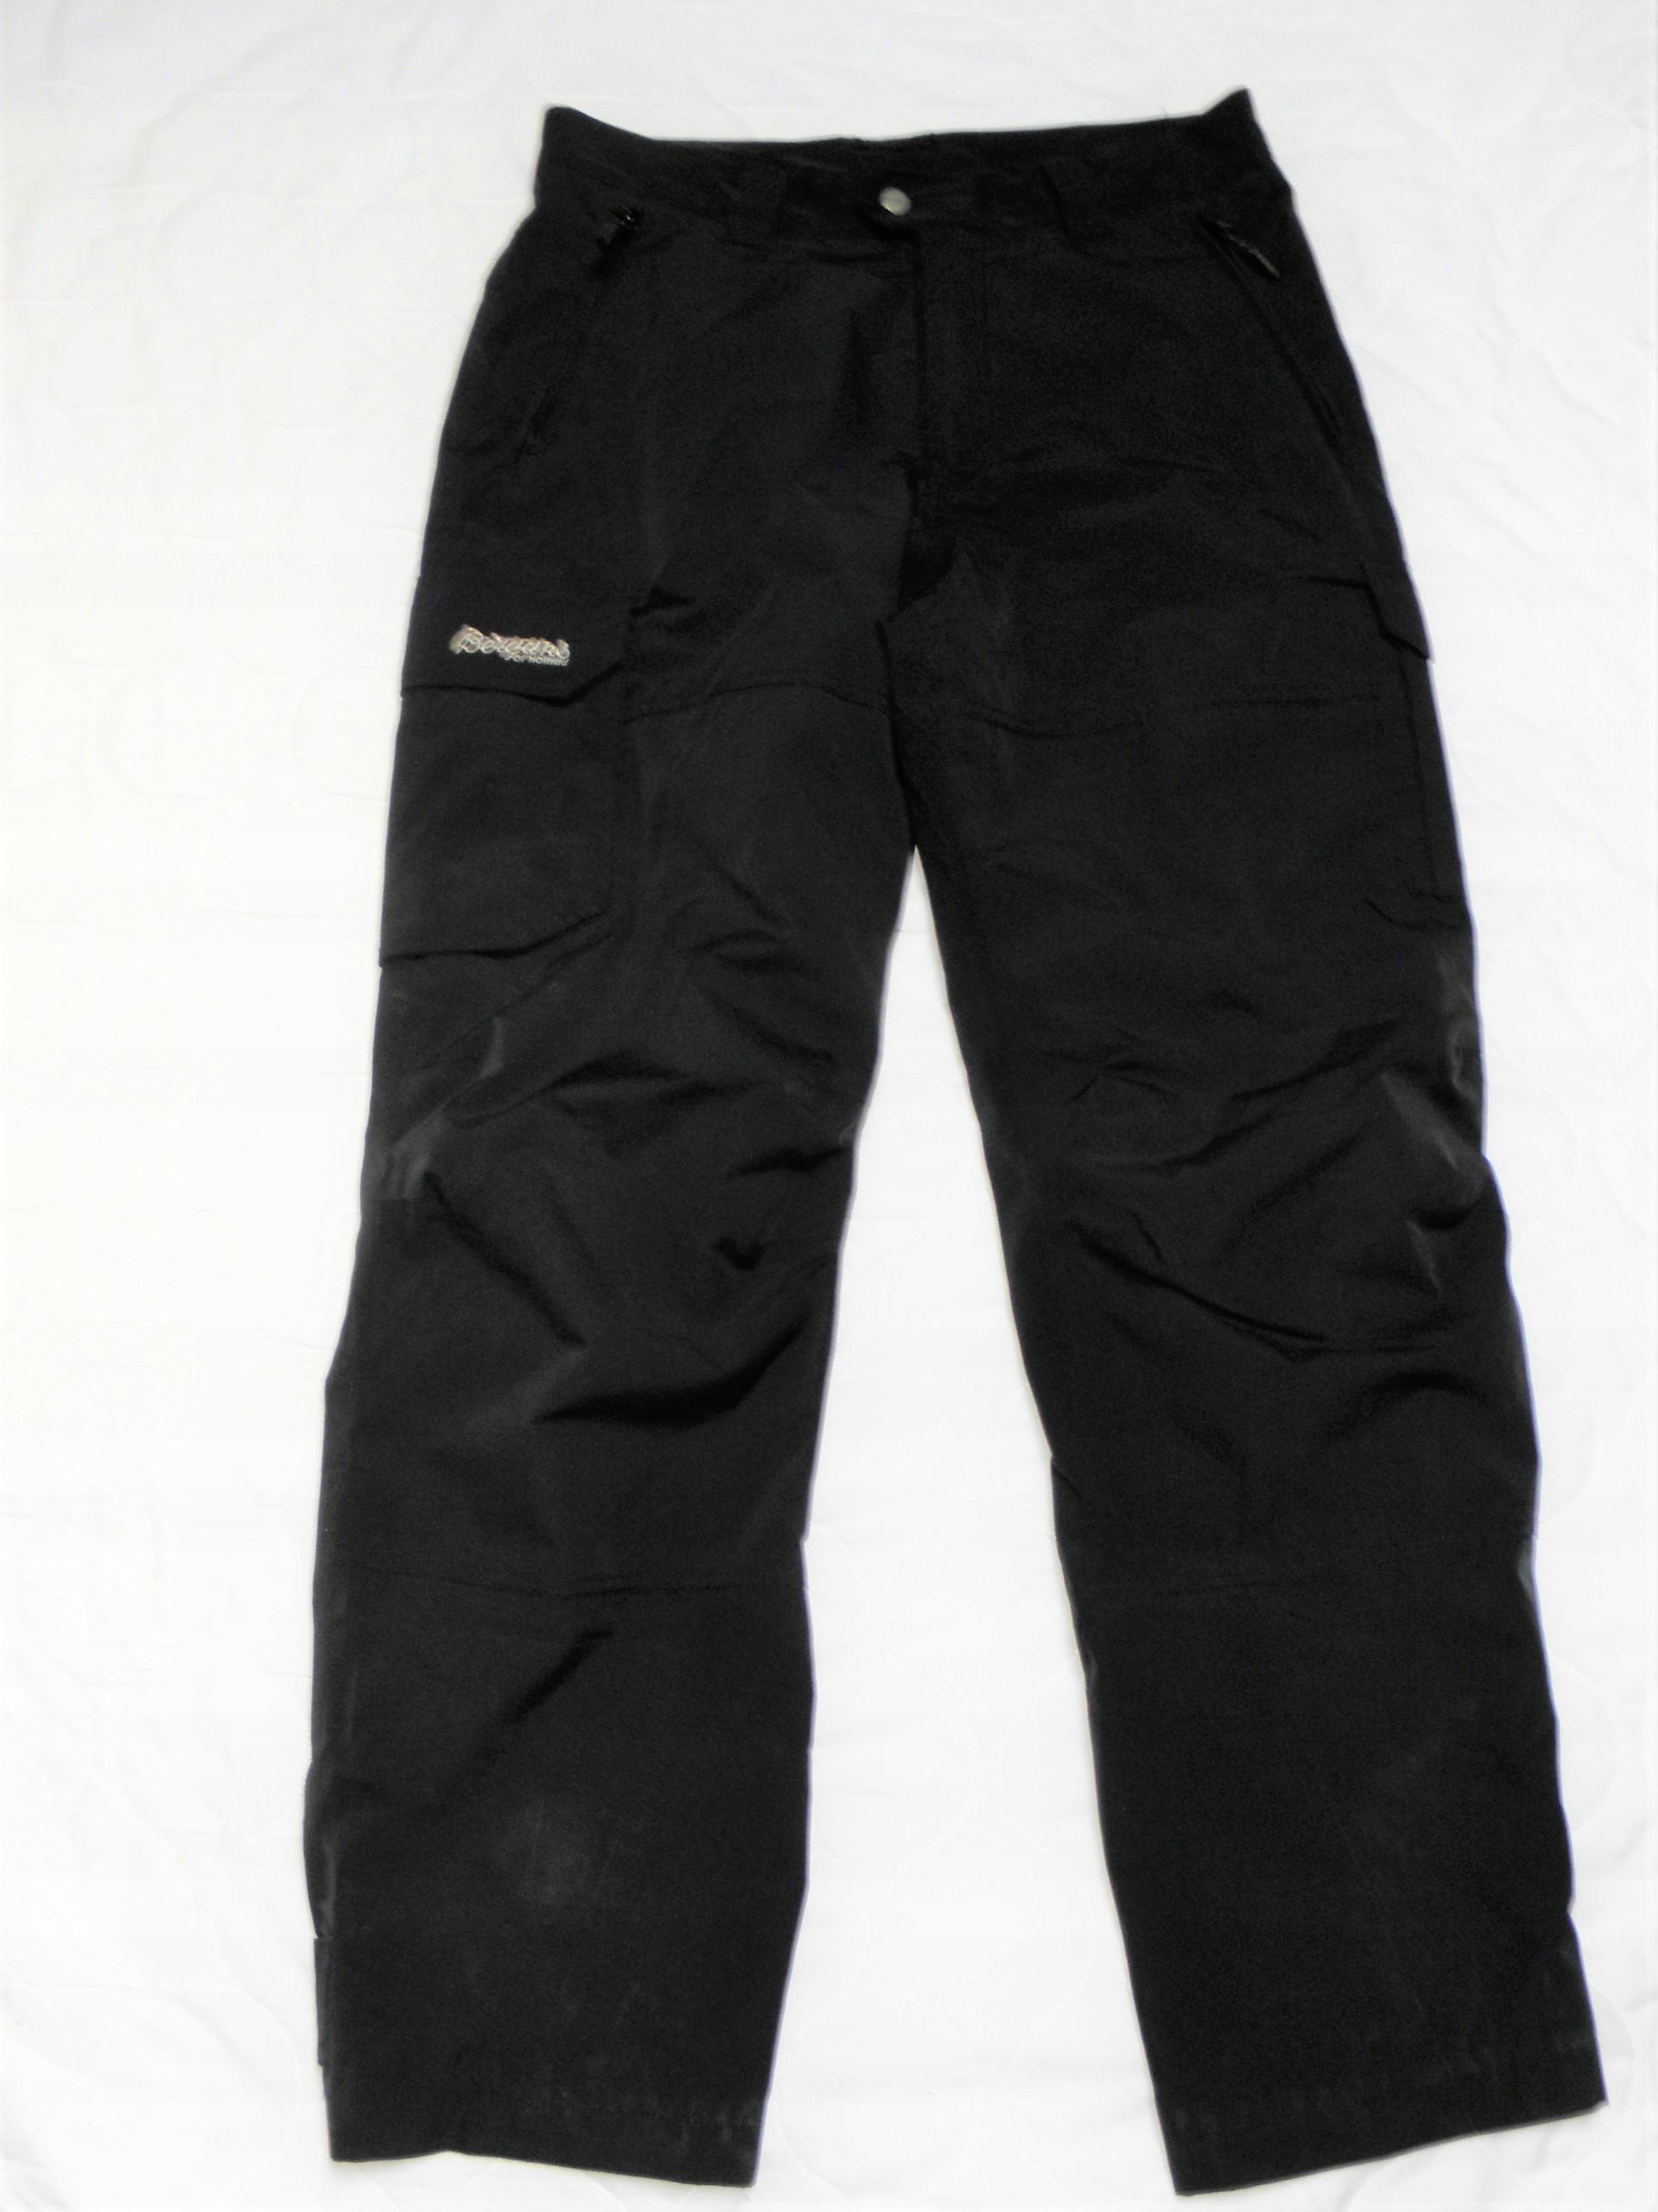 BERGANS OF NORWAY Spodnie trekingowe Dermizax r.L